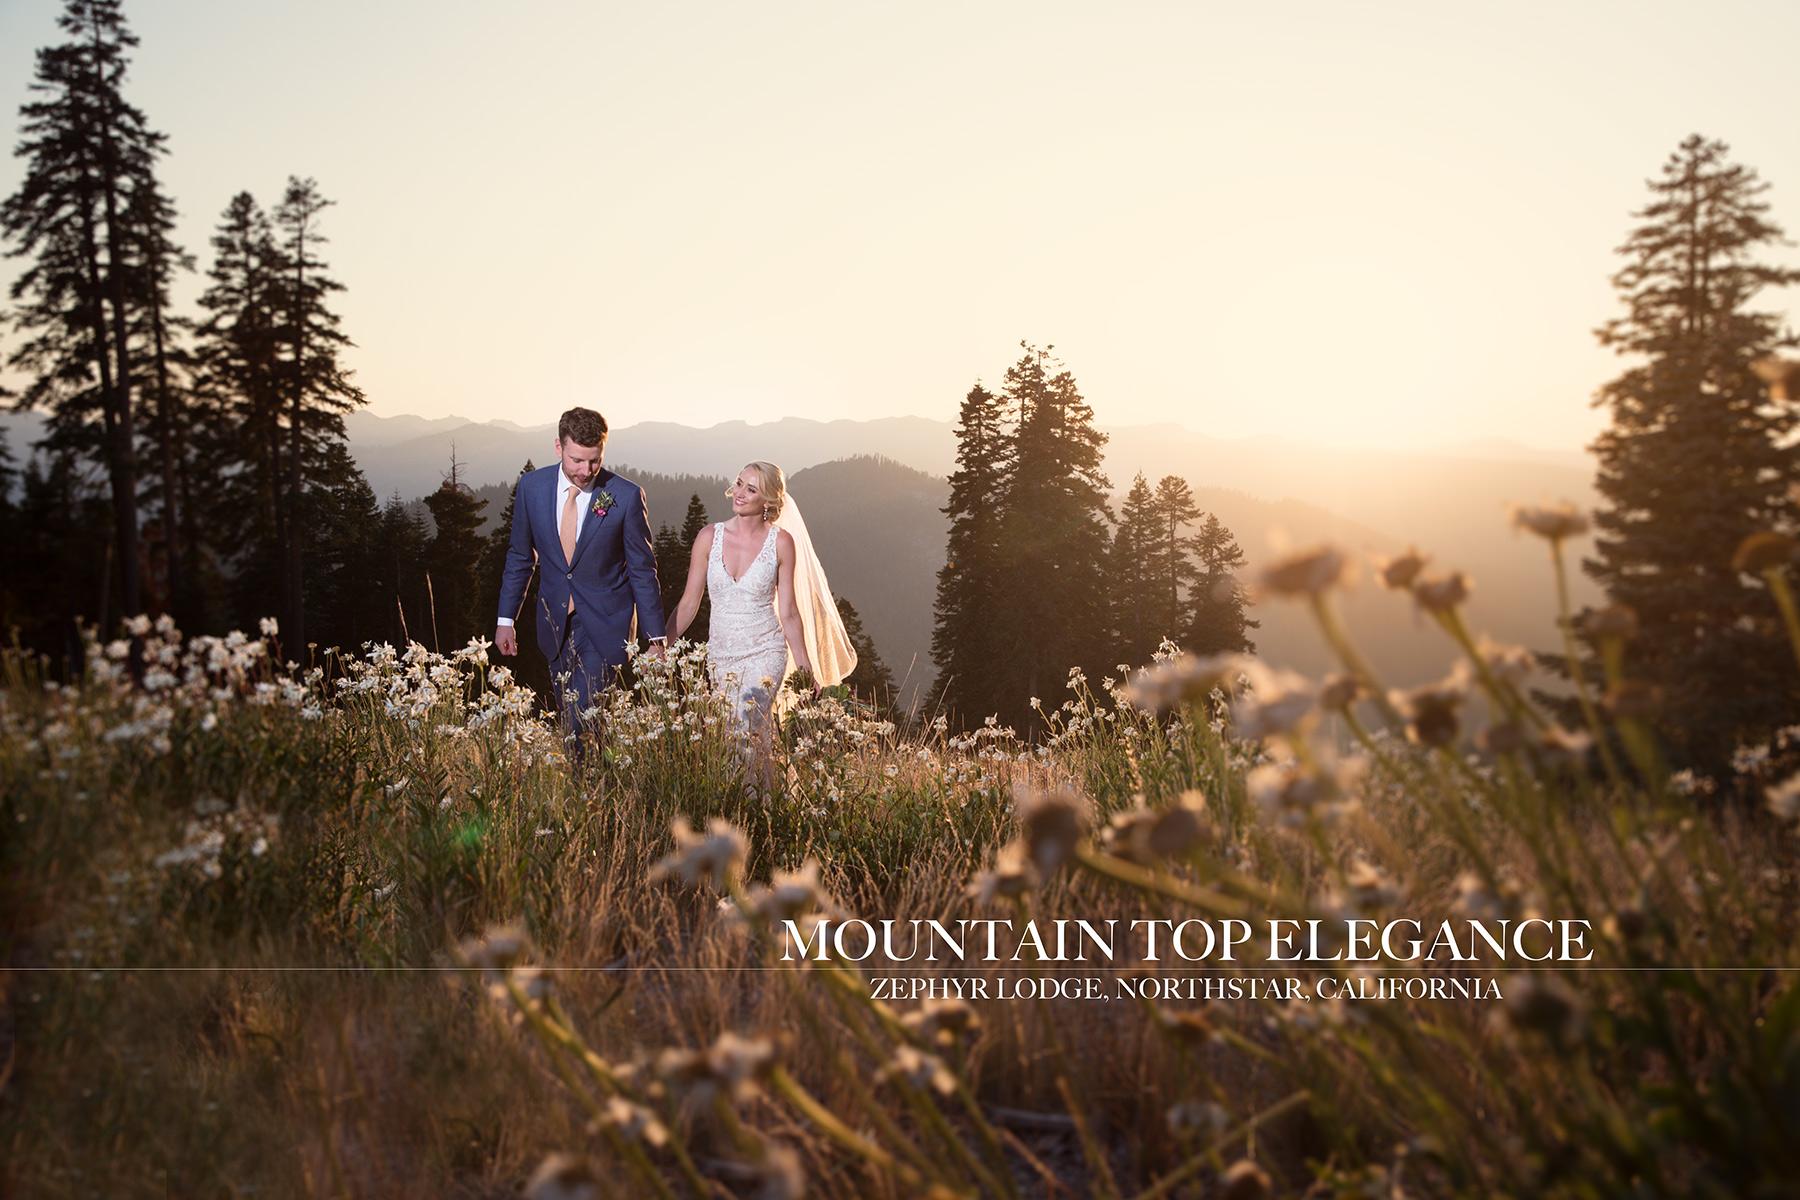 Zephyr-Lodge-wedding-Northstar-mountain